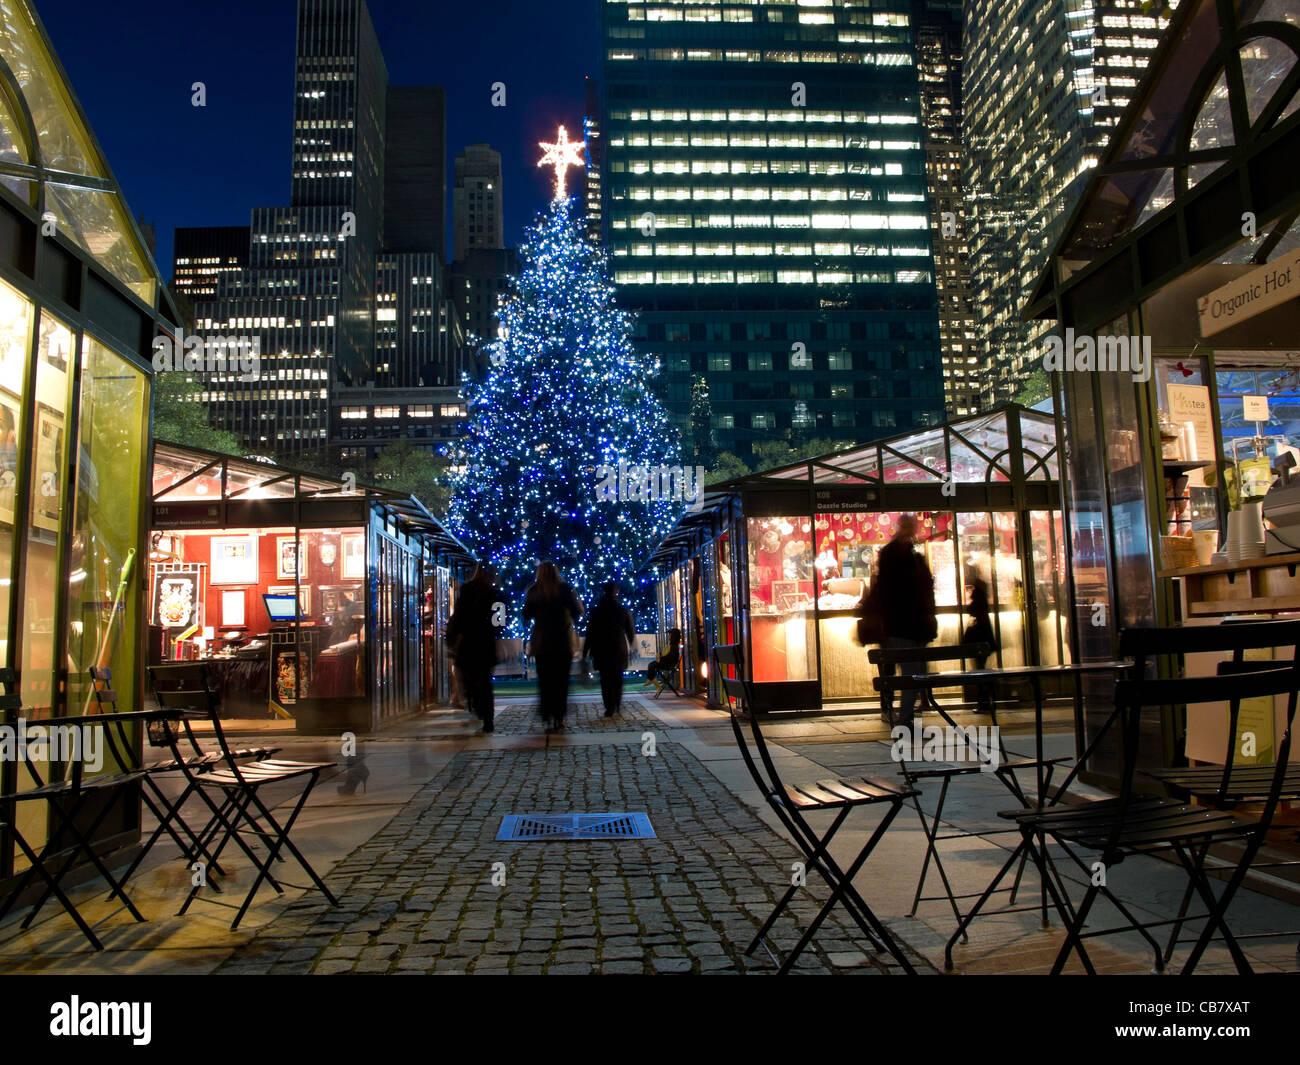 Christmas Market, Tree, Bryant Park, NYC Stock Photo: 41356304 - Alamy